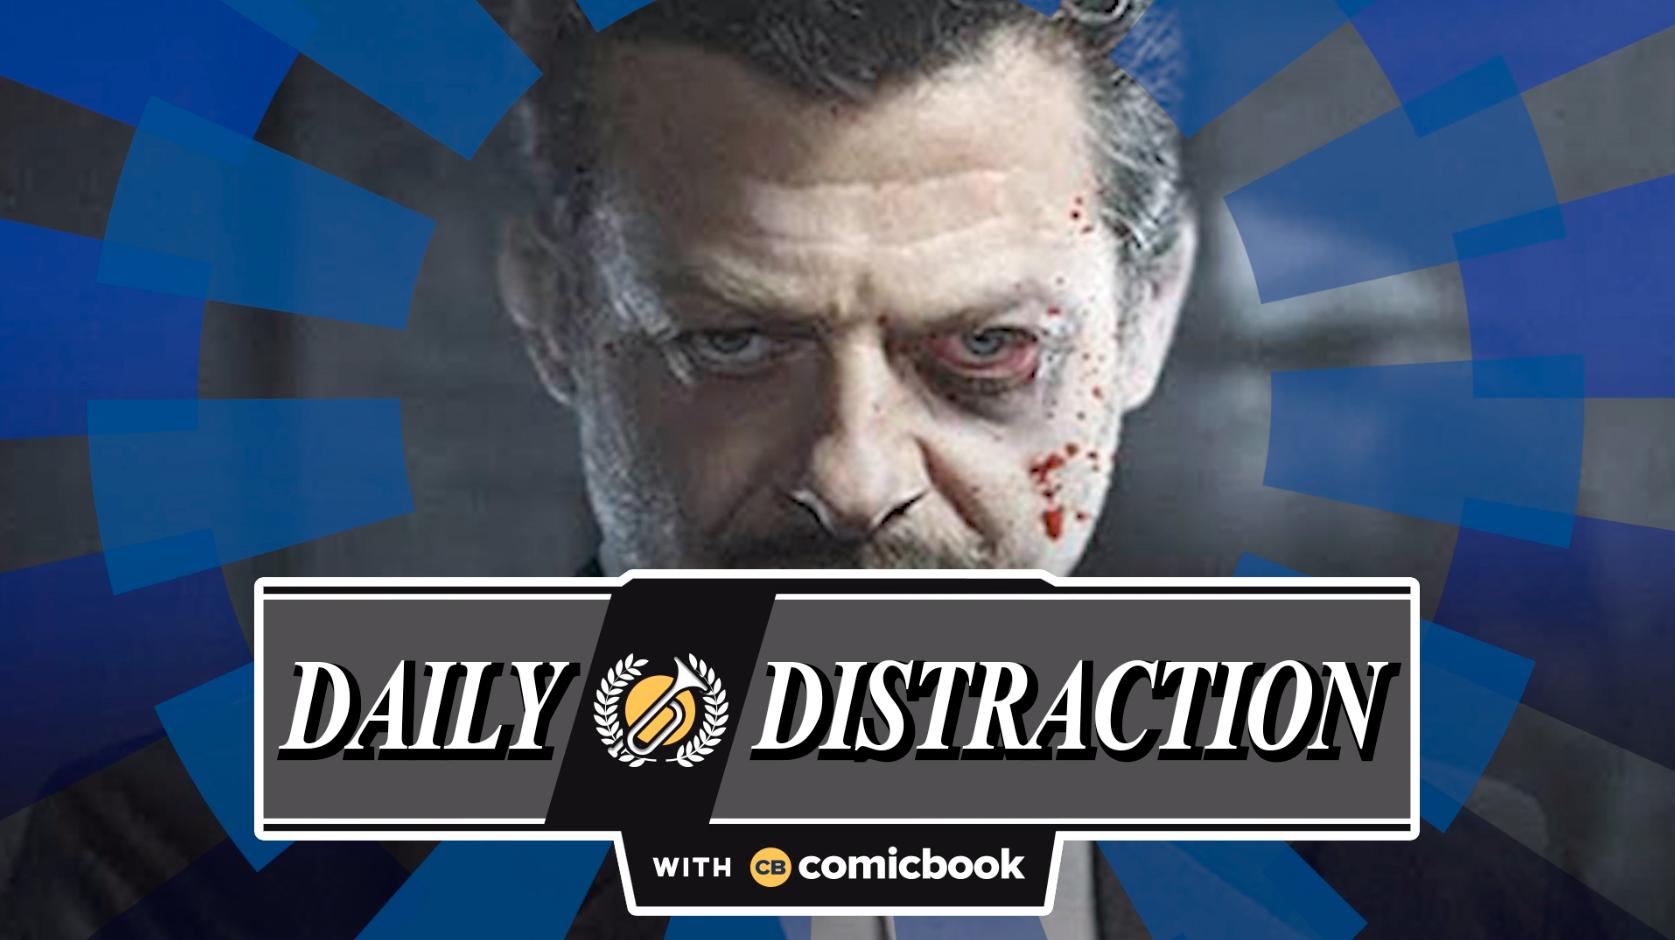 Daily Distraction - November 14, 2019 screen capture